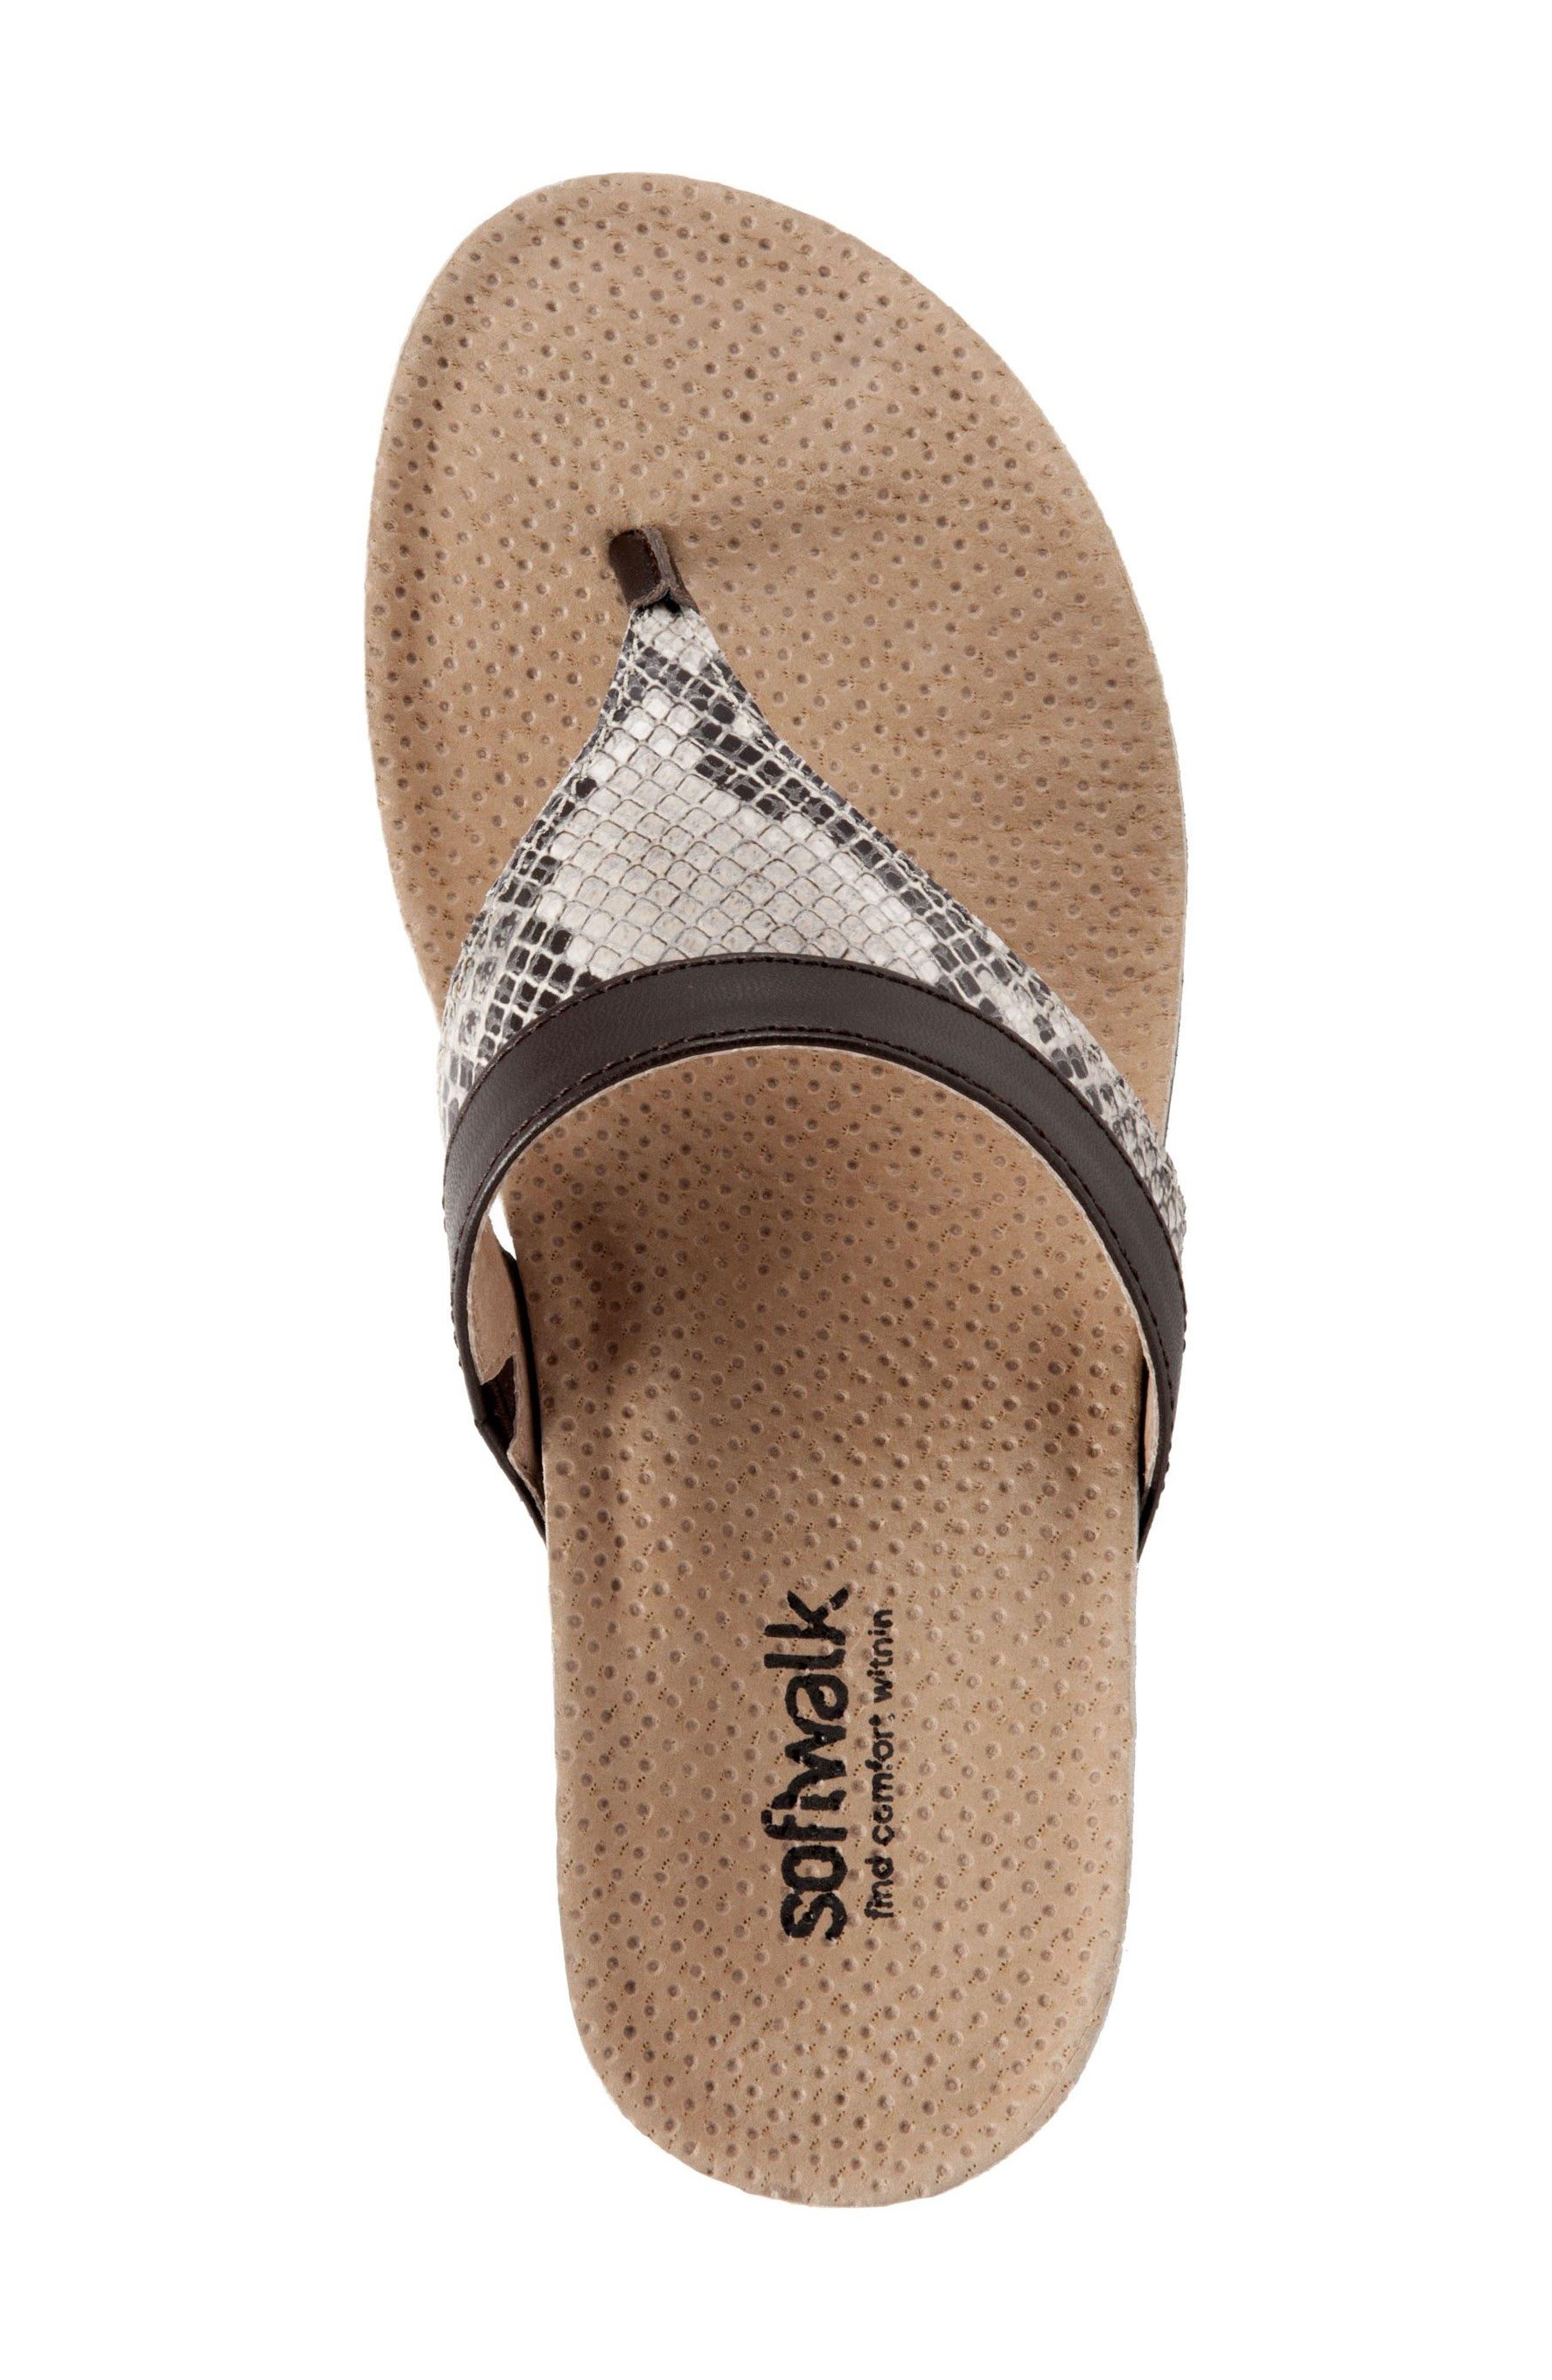 Heights Wedge Slide Sandal,                             Alternate thumbnail 3, color,                             Brown Leather